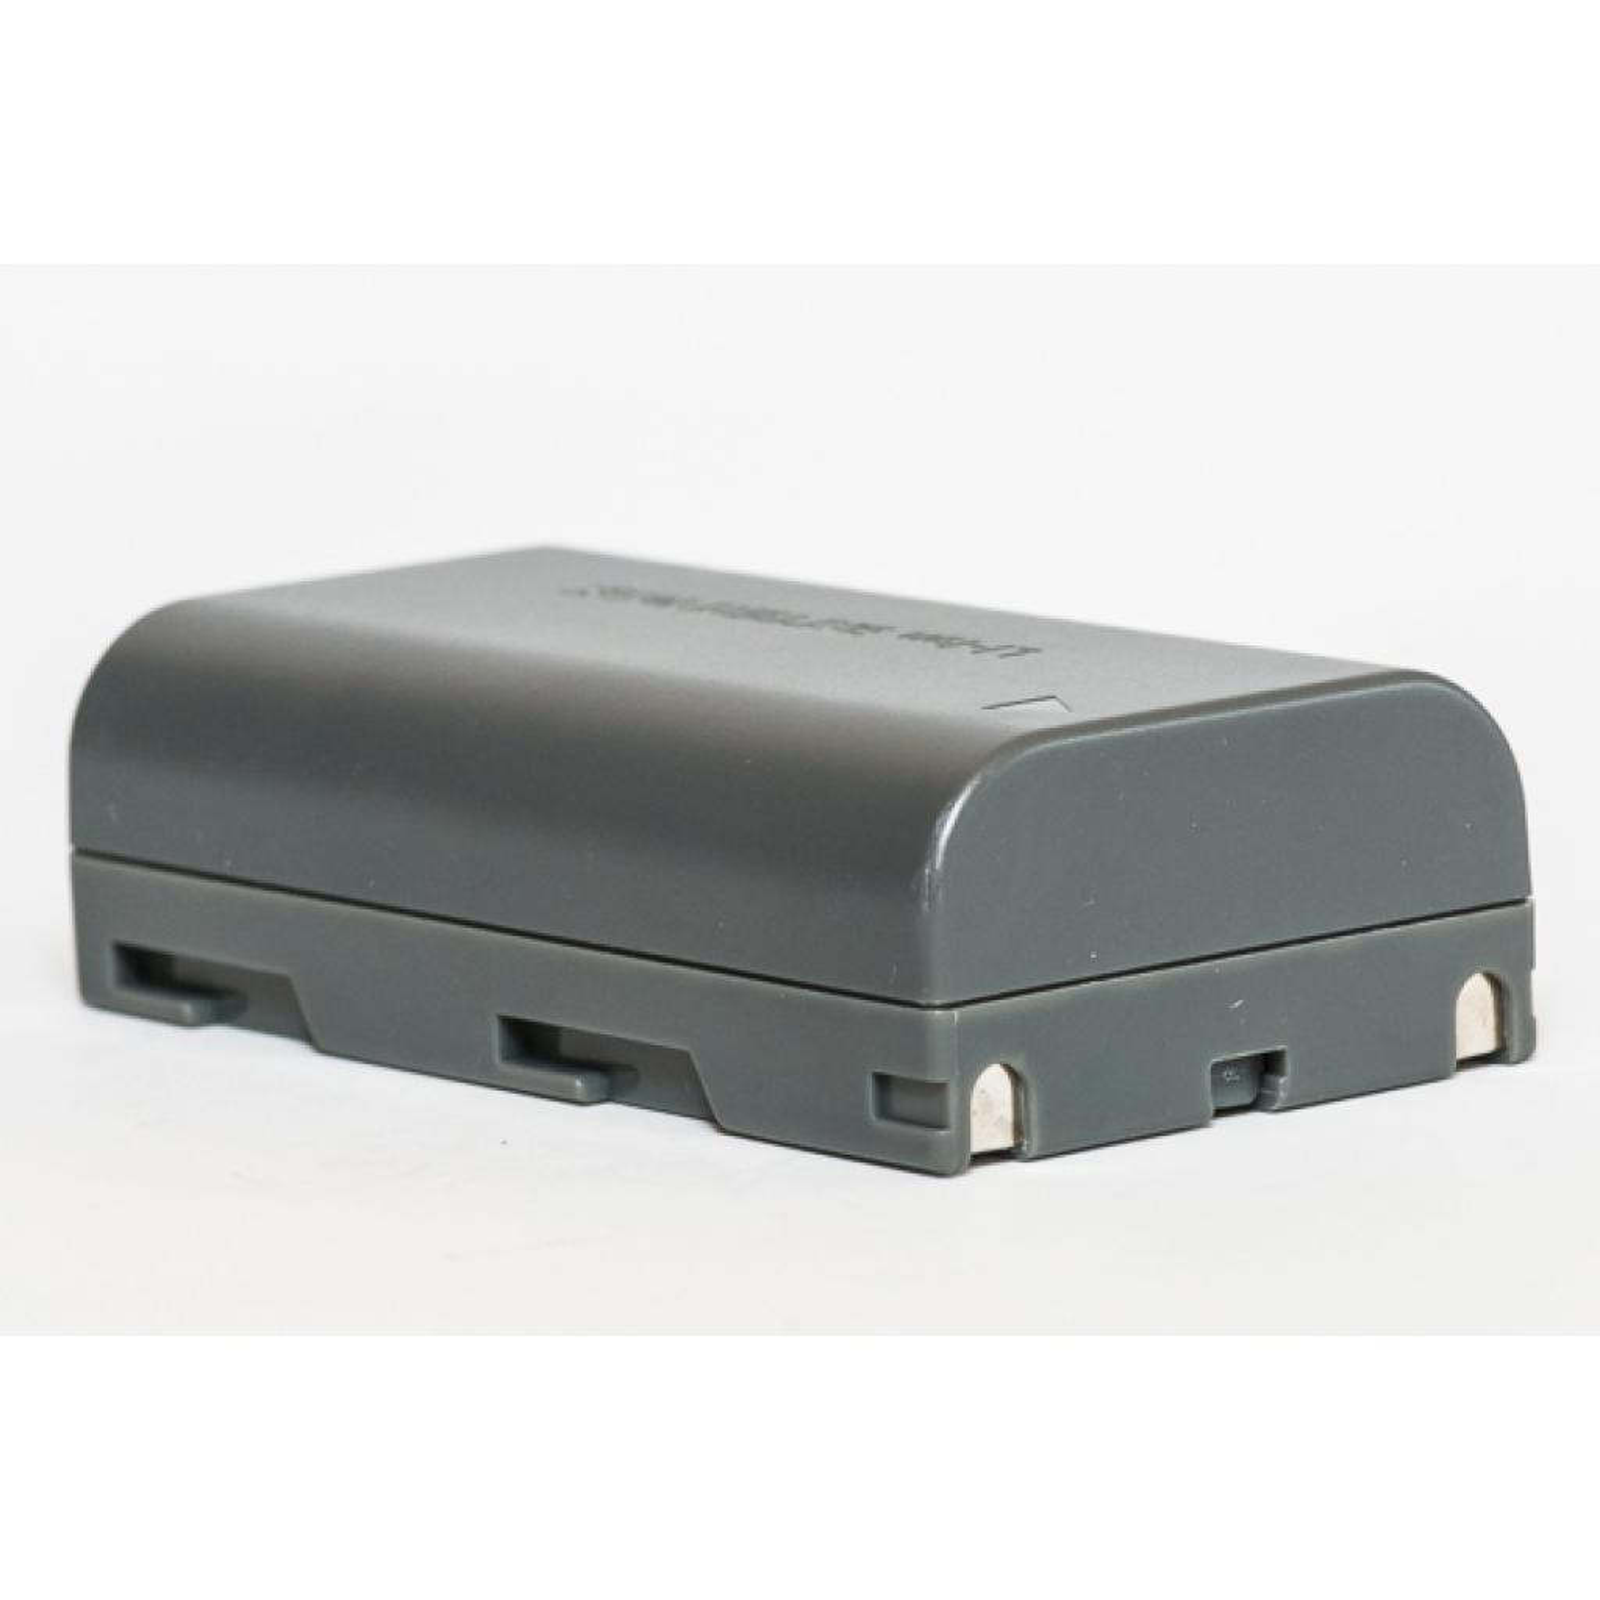 Аккумулятор к фото/видео PowerPlant Samsung SB-L160 (DV00DV1277) изображение 2